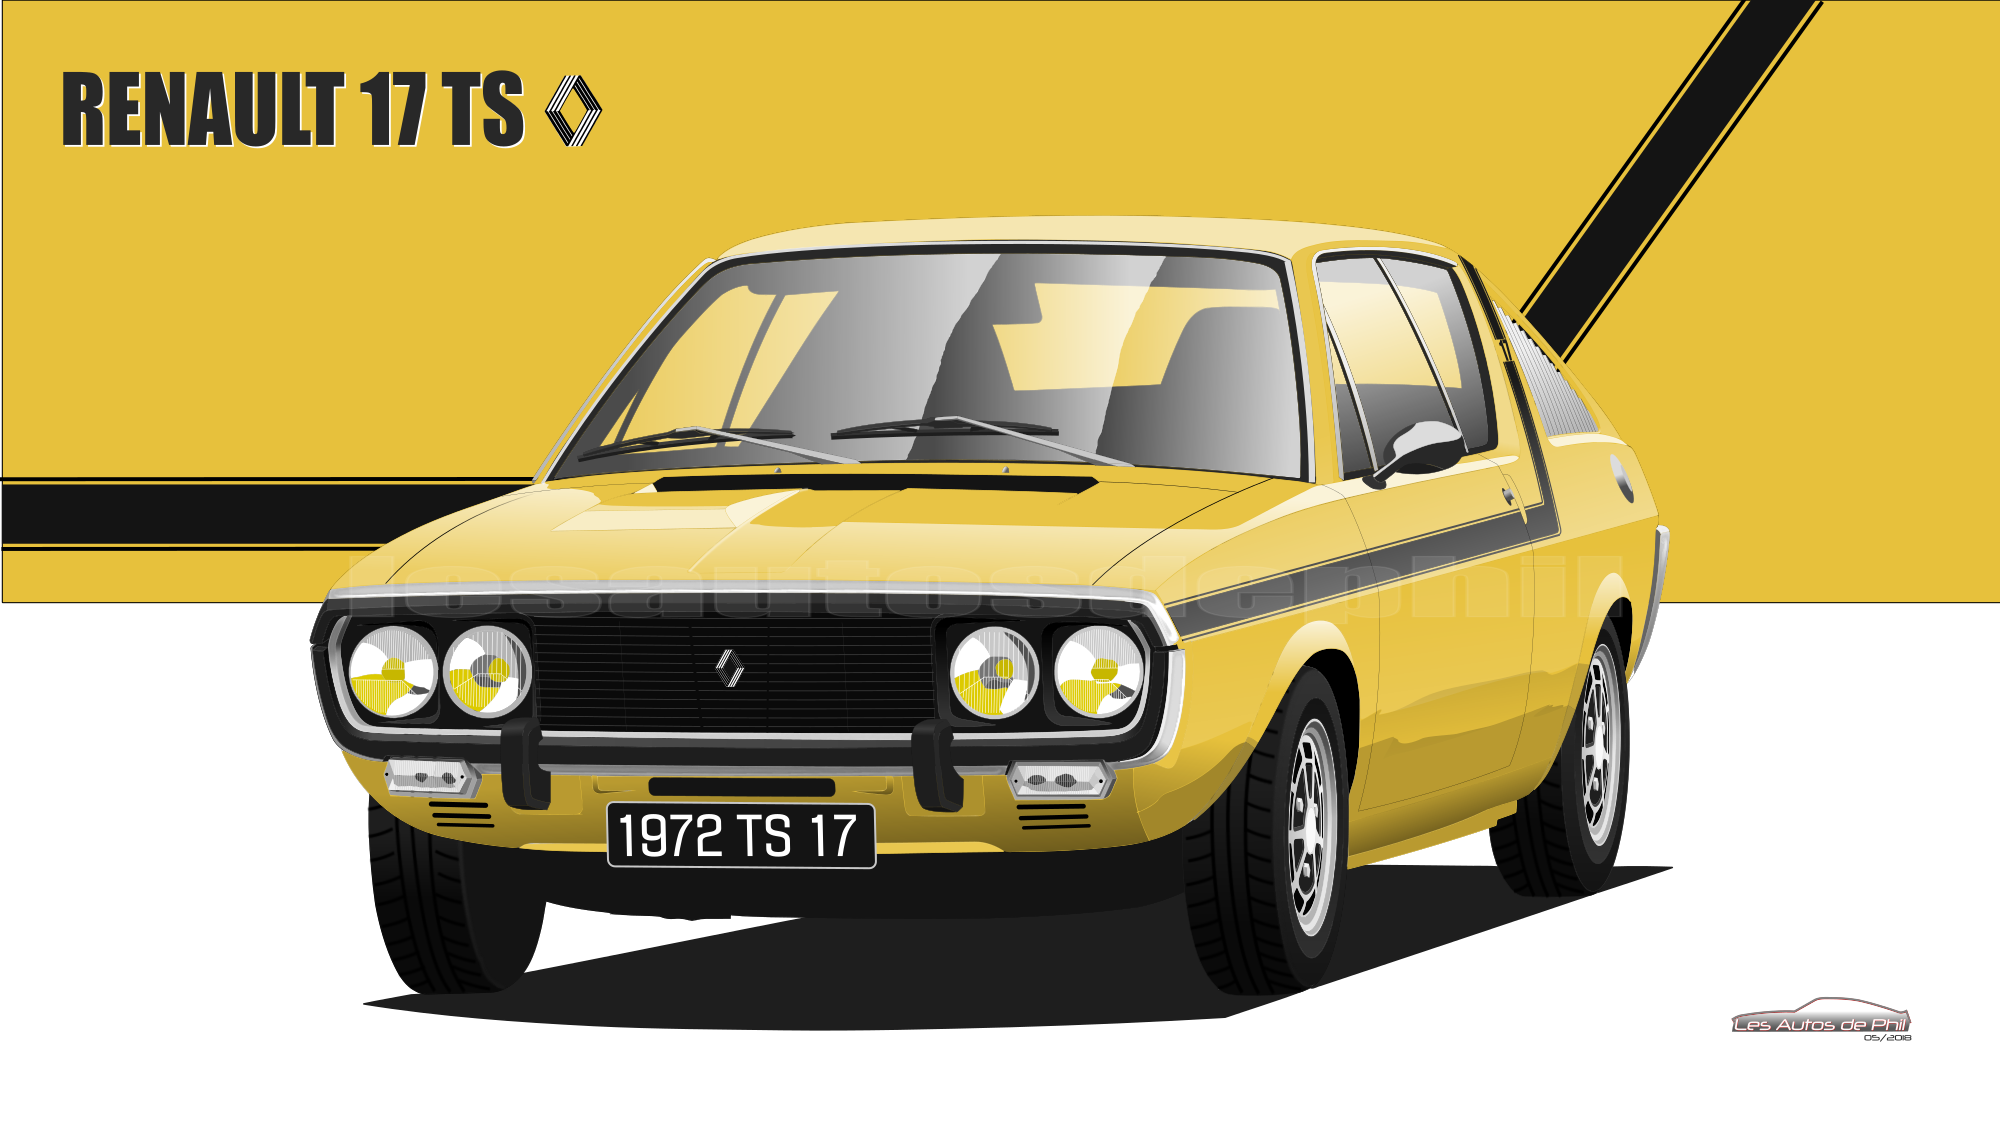 R17 TS jaune blog w